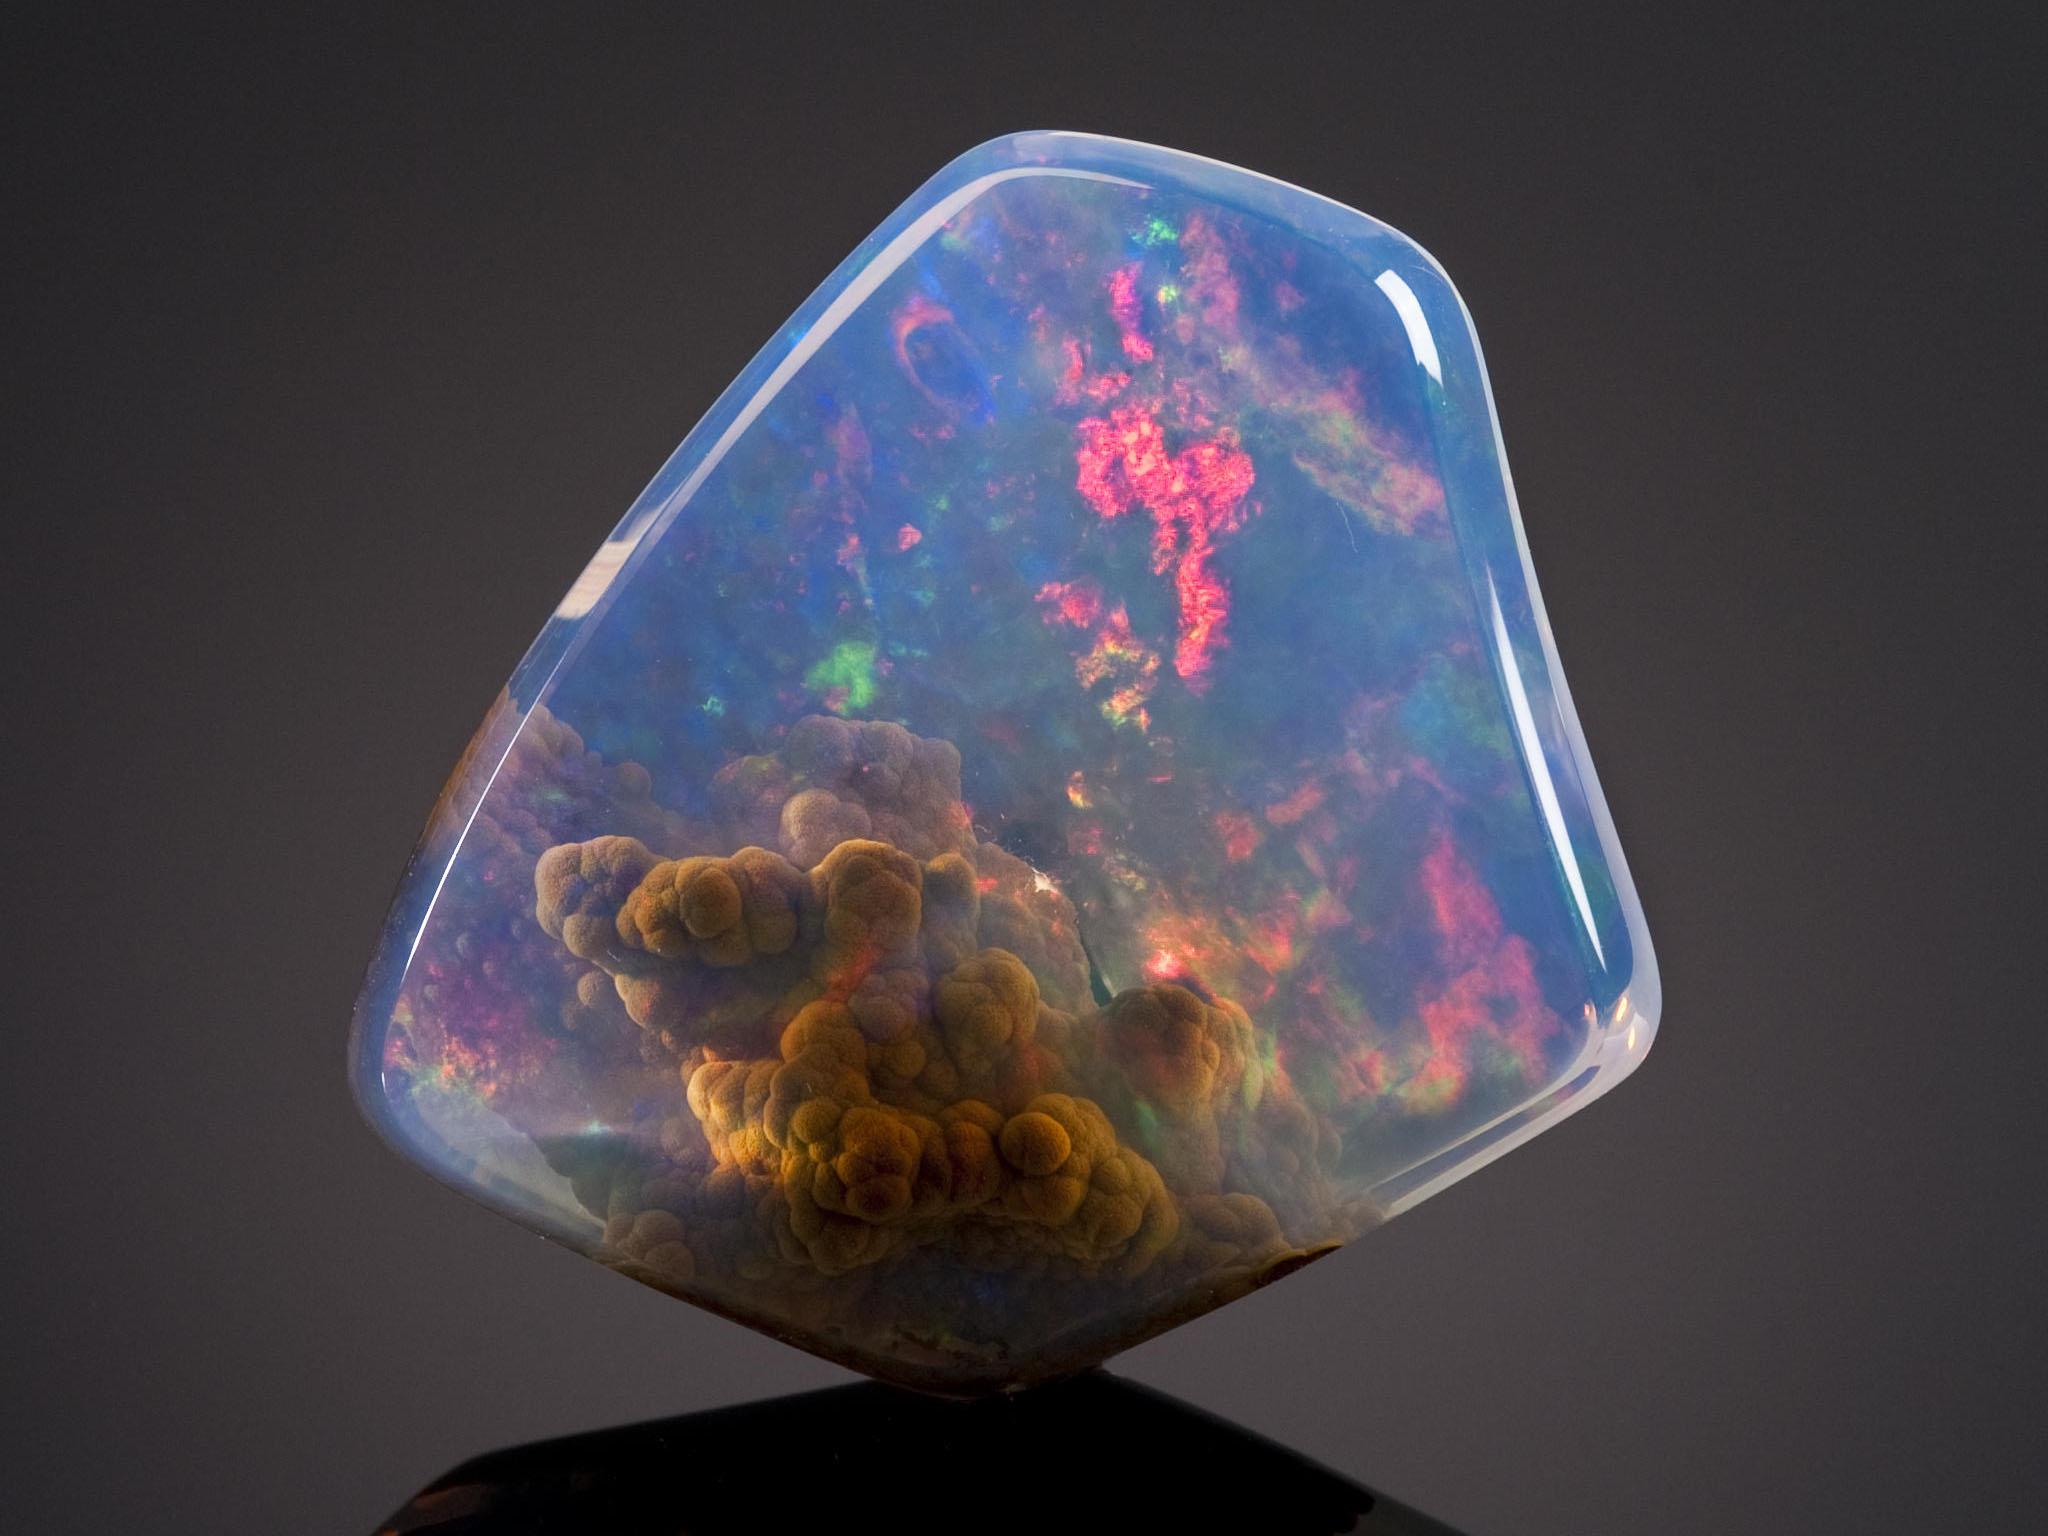 камень опал голубой фото